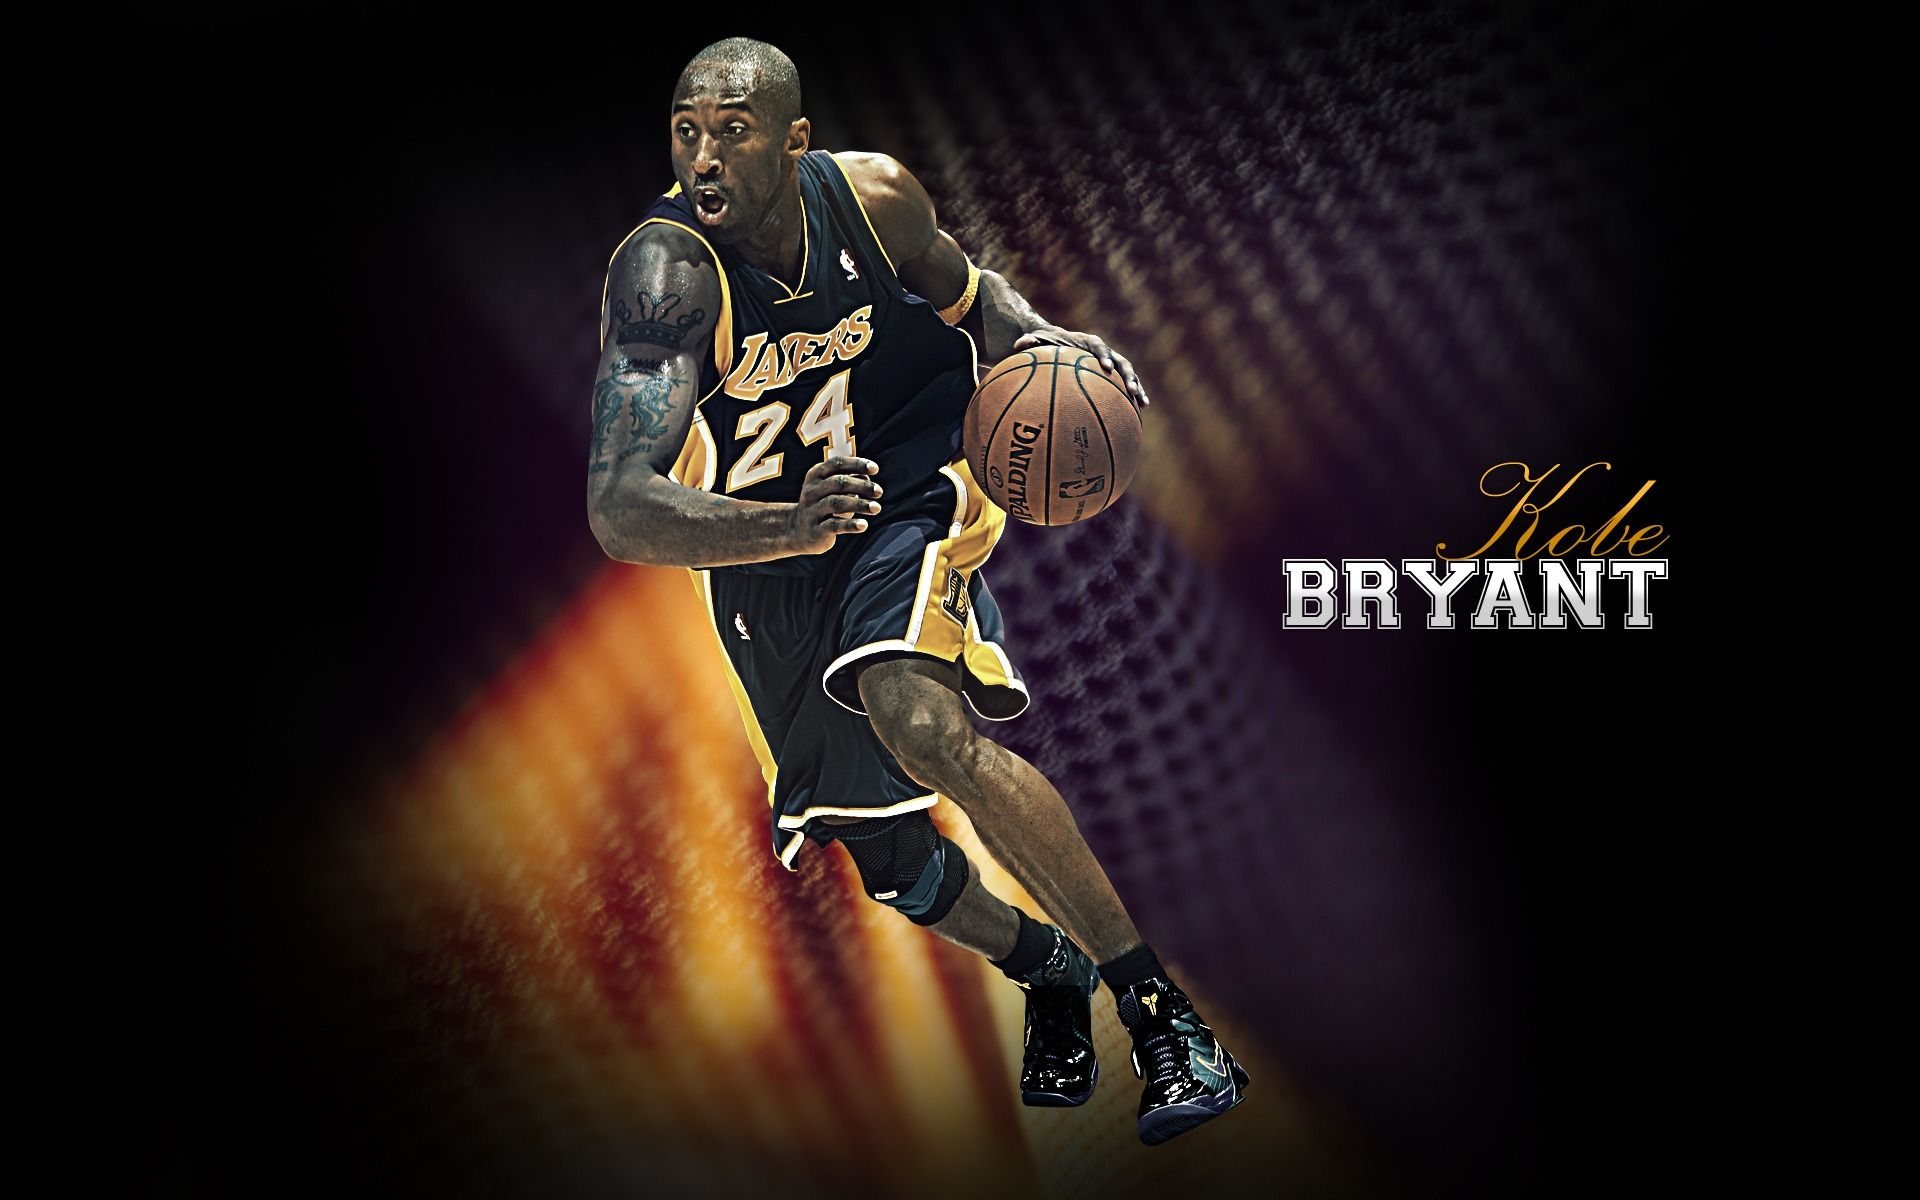 Kobe Bryant Wallpapers 2015 1920x1200